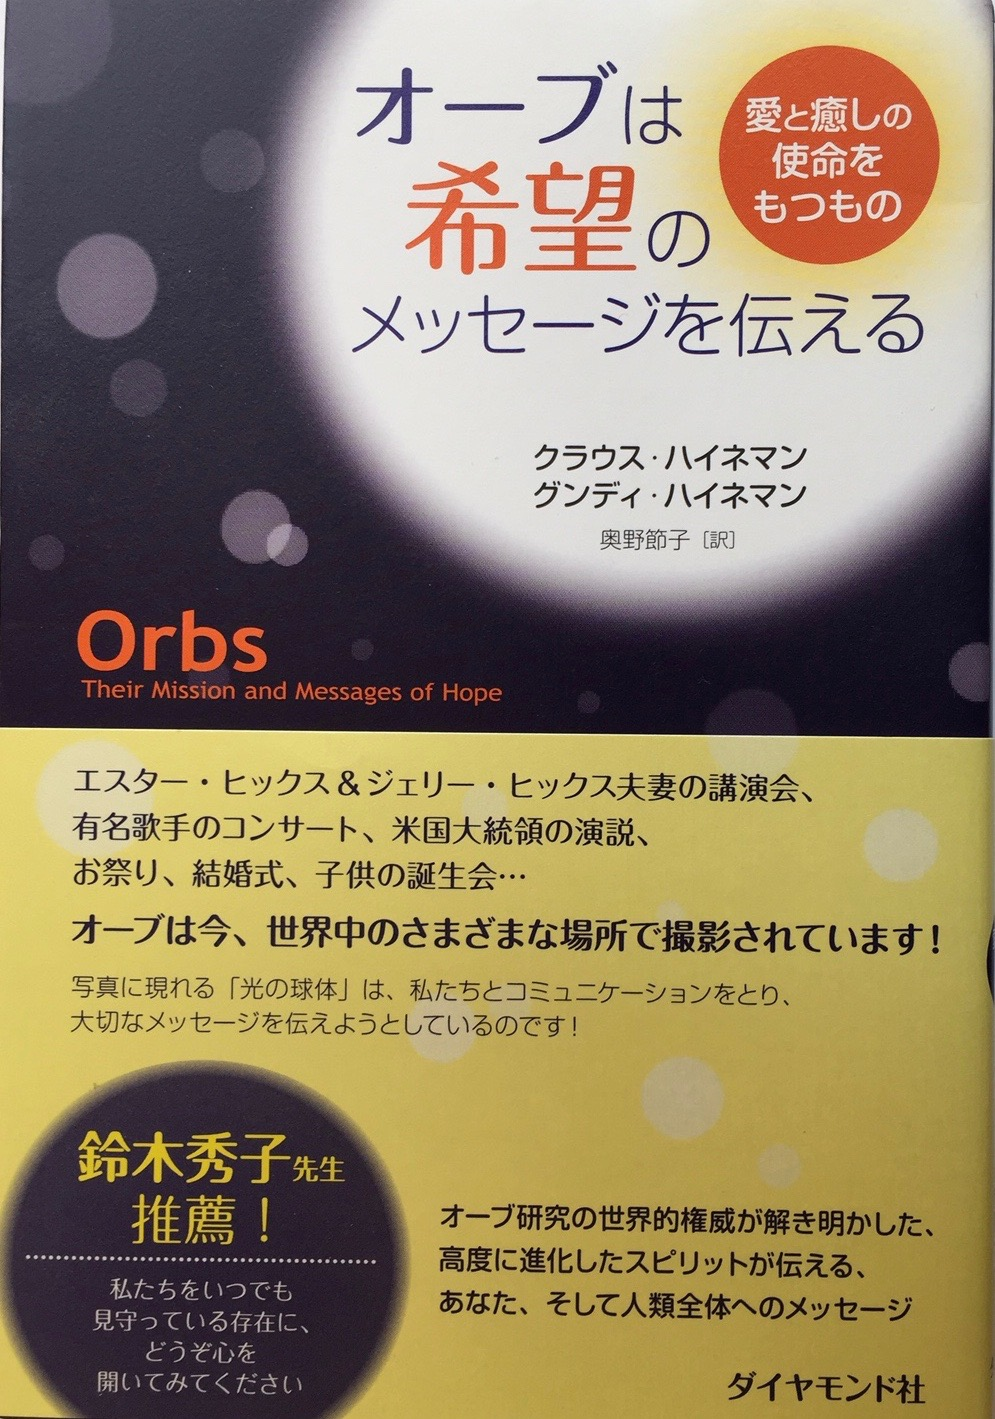 Japanese edition (ISBN 978-4-478-01567-4; 2011)